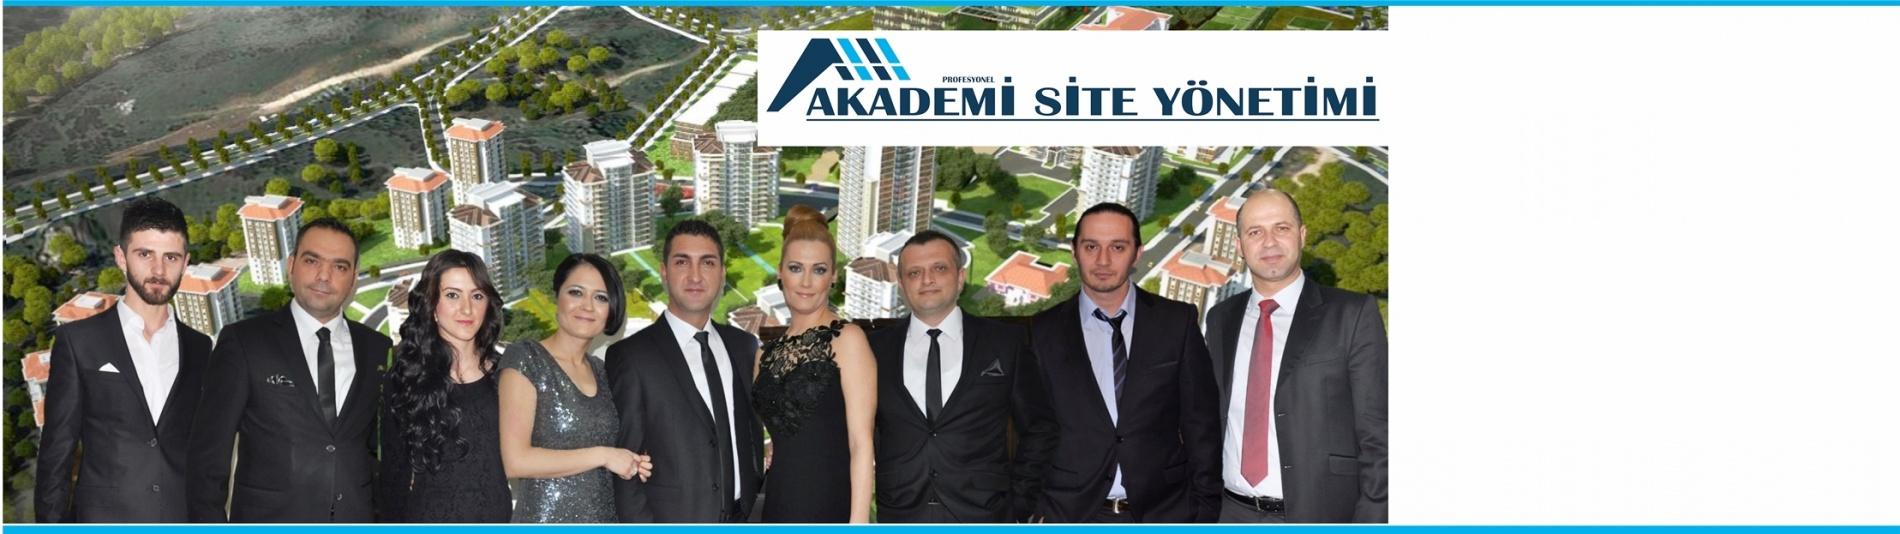 Akademi Profesyonel Site Yonetimi, izmit site yonetim, kocaeli site yonetim